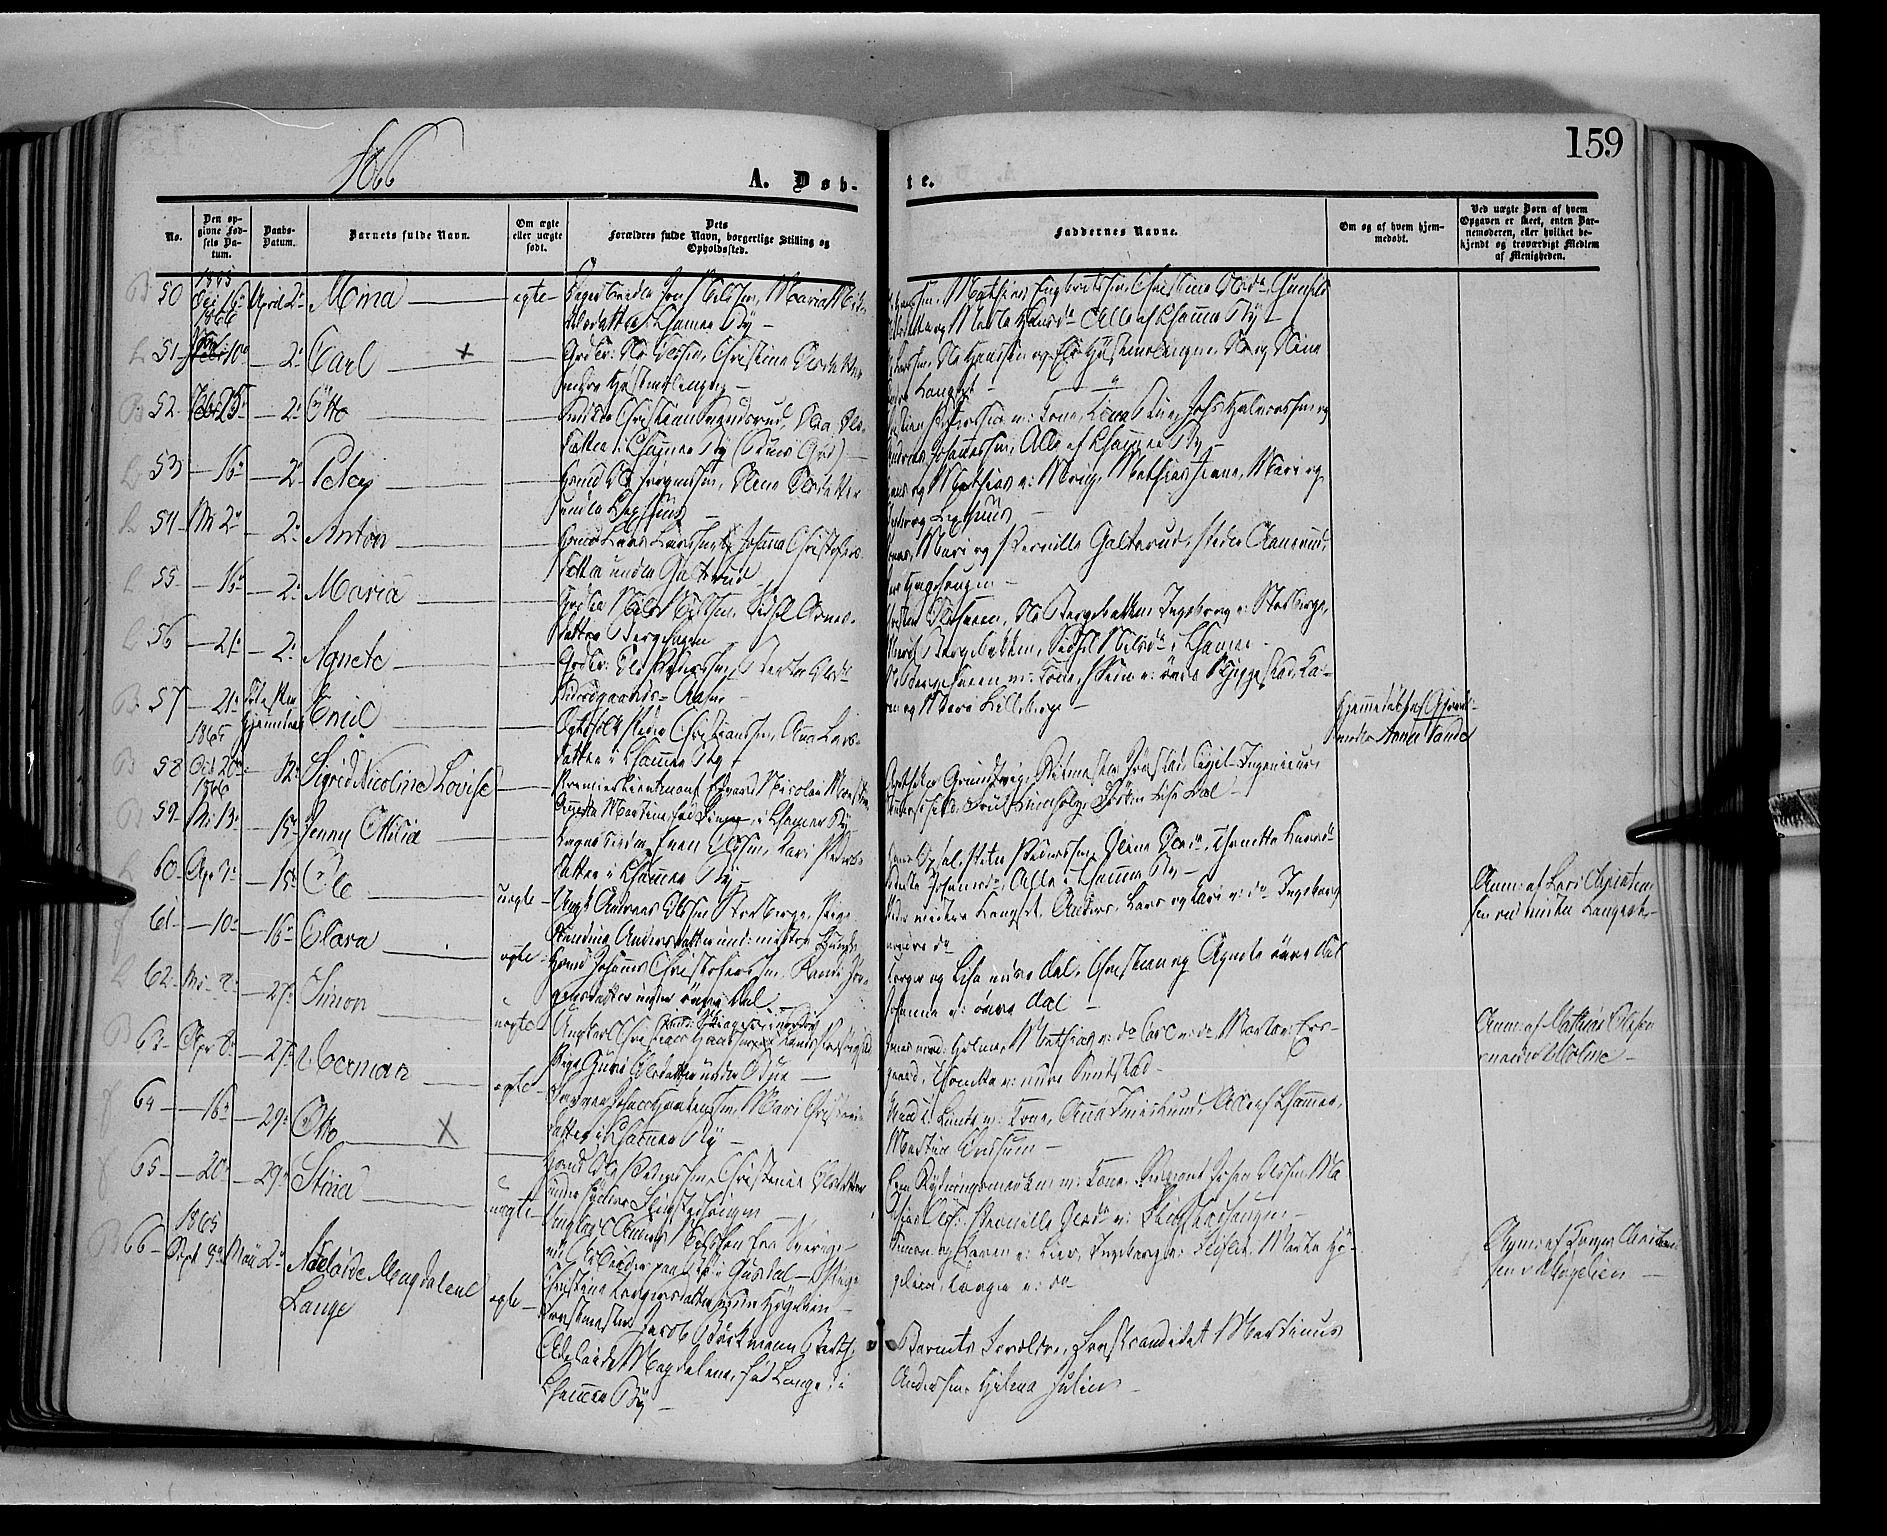 SAH, Fåberg prestekontor, H/Ha/Haa/L0006: Ministerialbok nr. 6A, 1855-1867, s. 159